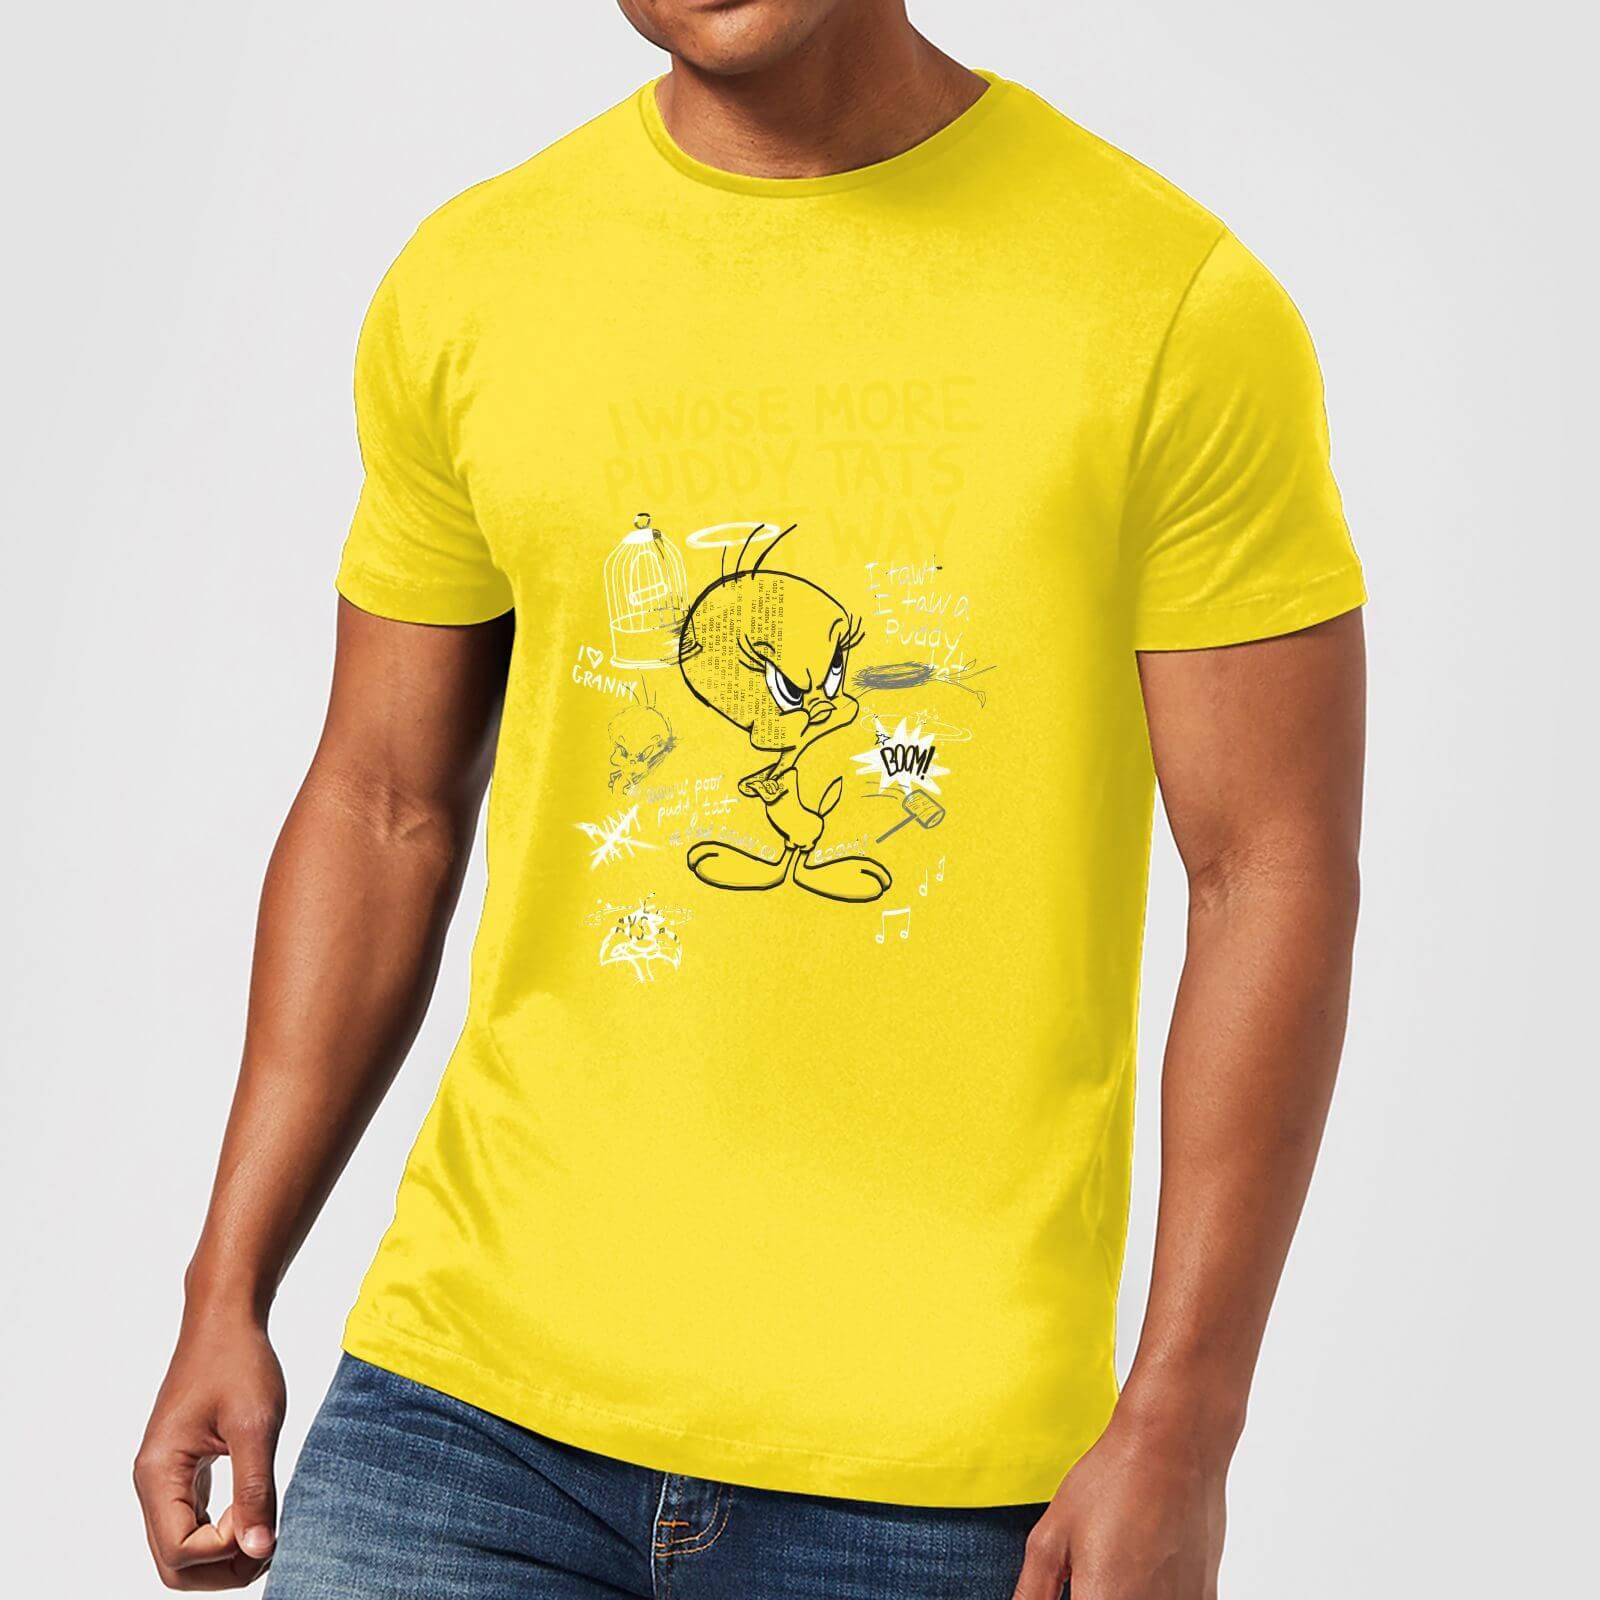 Tunes Fâché T Shirt Homme Jaune Looney Titi 0kPOnw